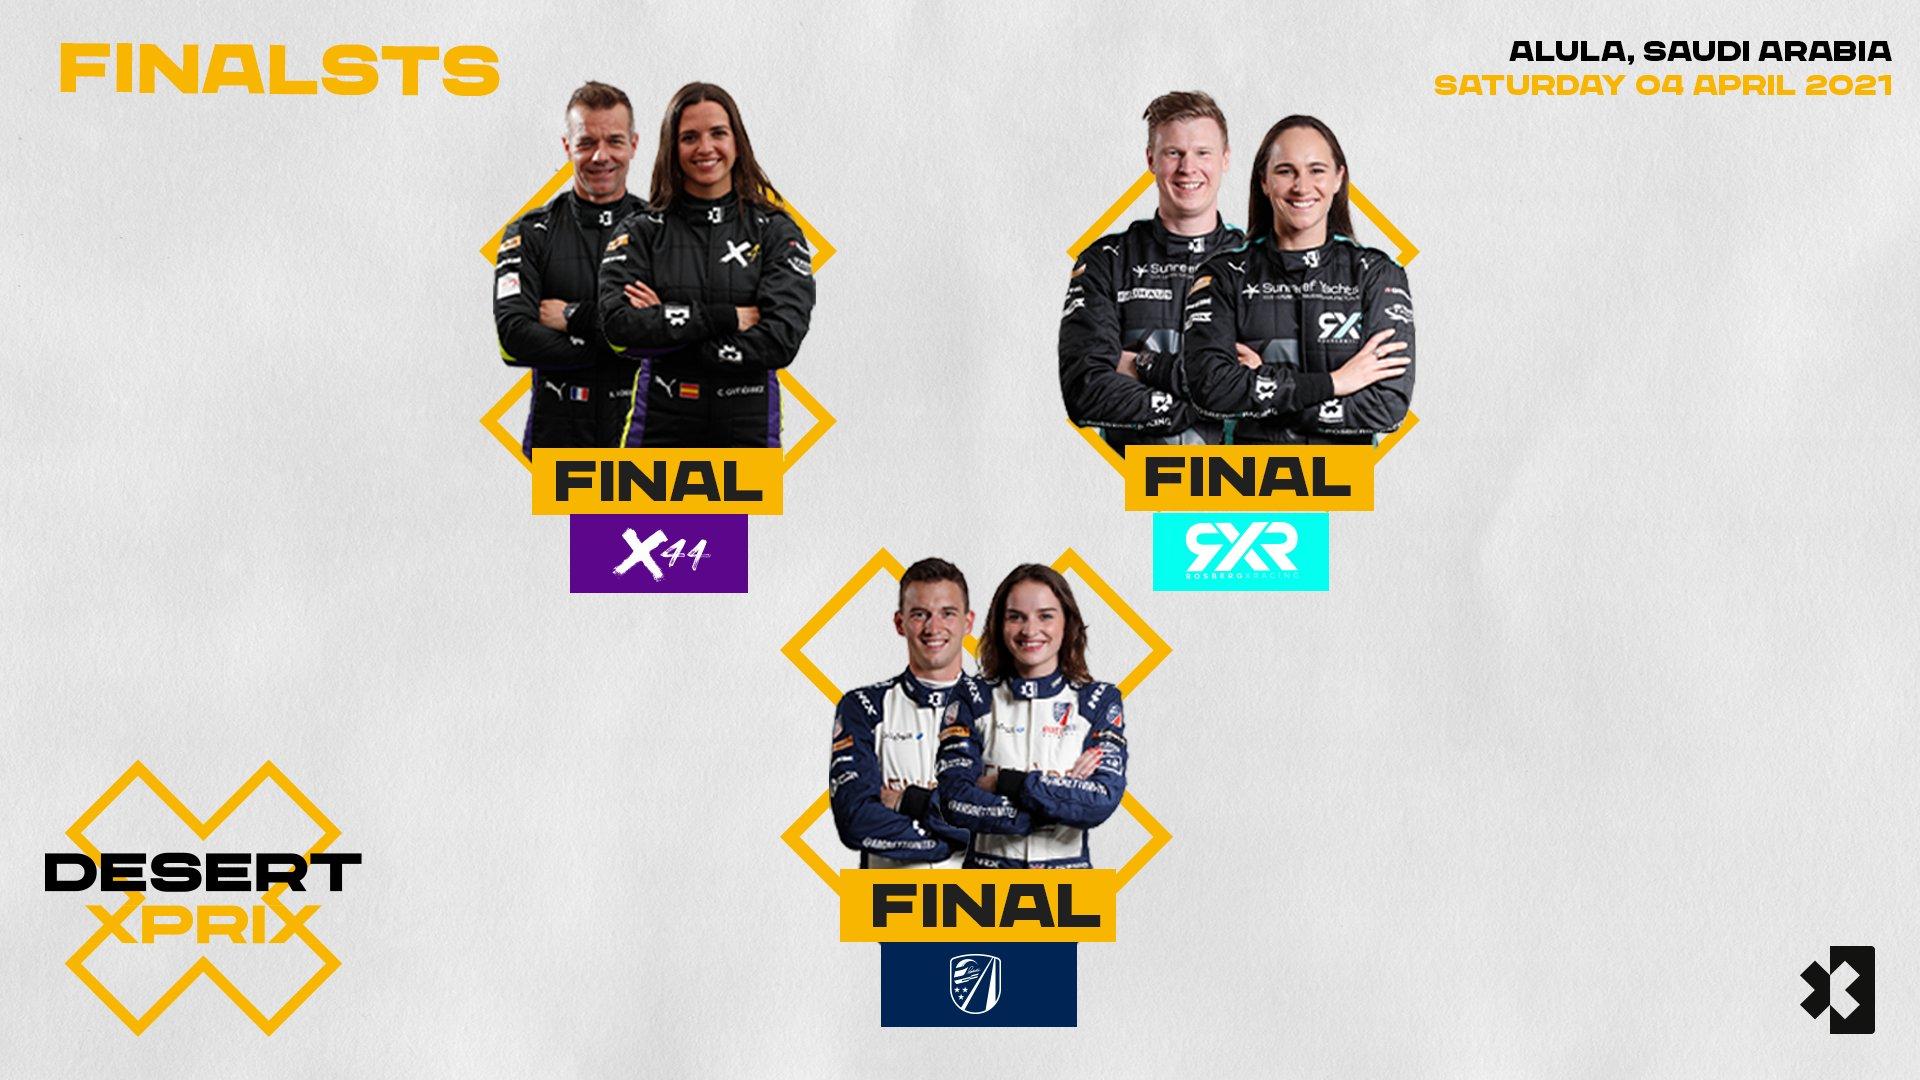 Extreme E- Desert X Prix Finalists